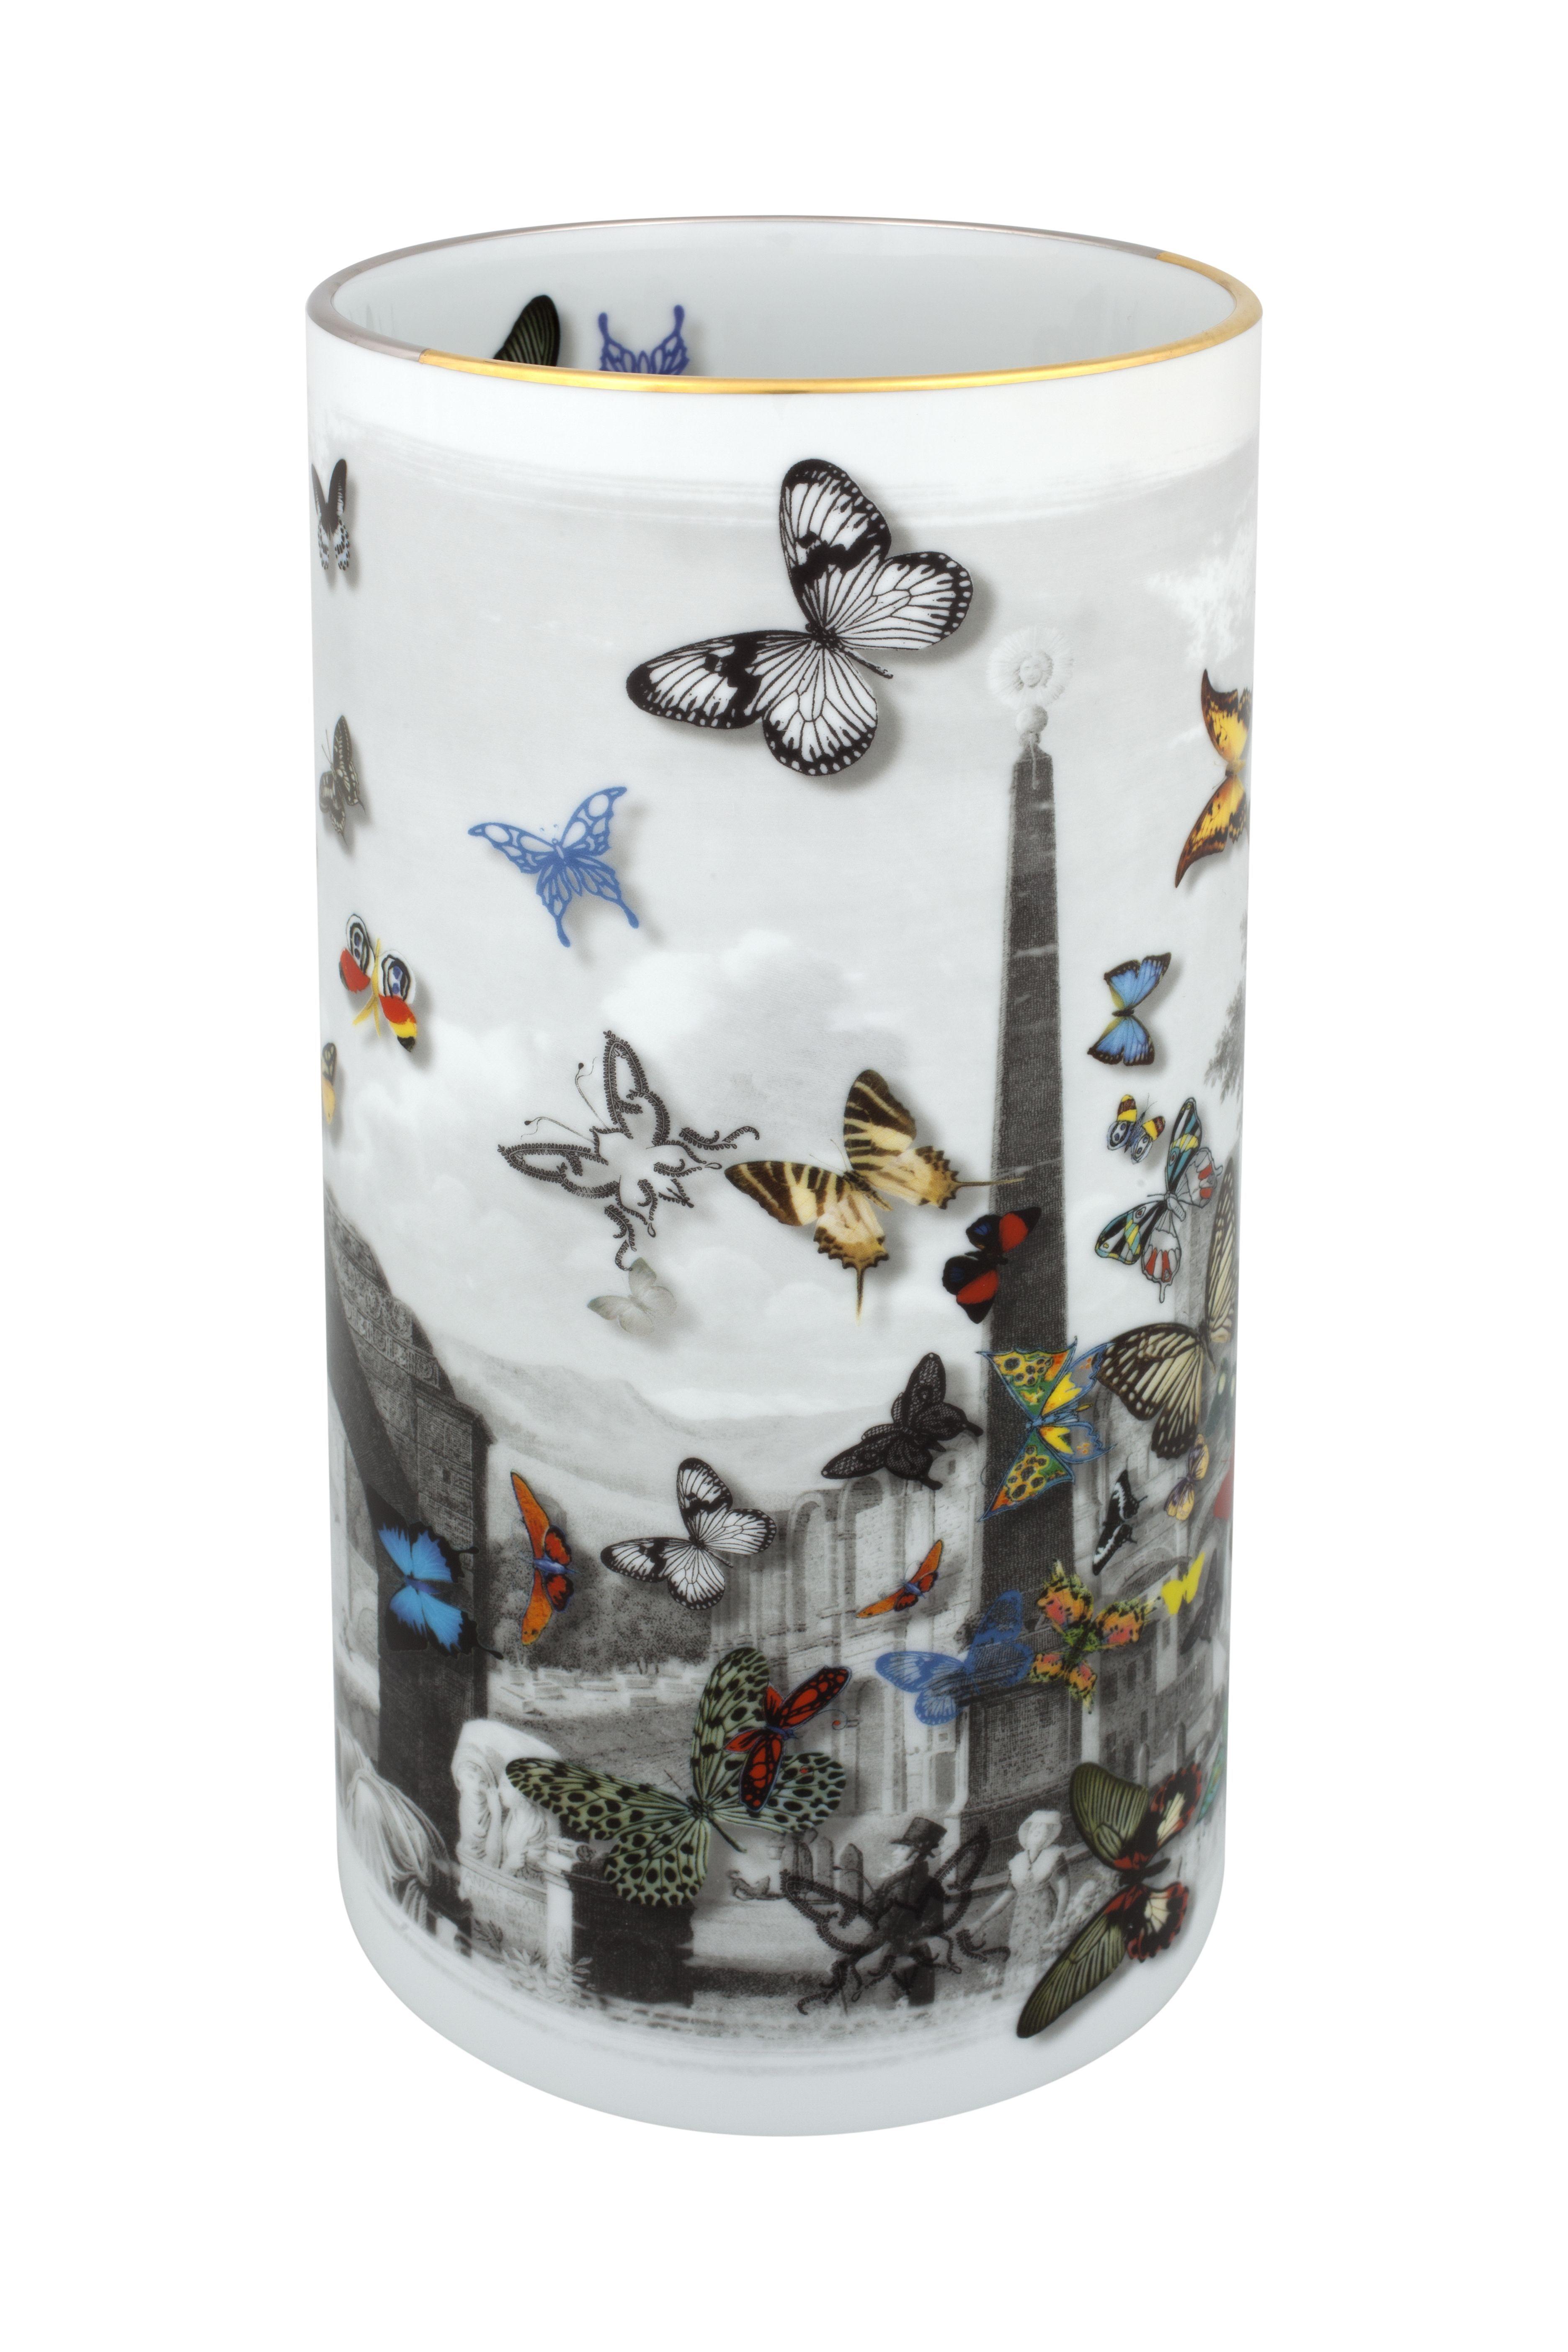 forum vase back vista alegre christian lacroix collection vista alegre pinterest. Black Bedroom Furniture Sets. Home Design Ideas